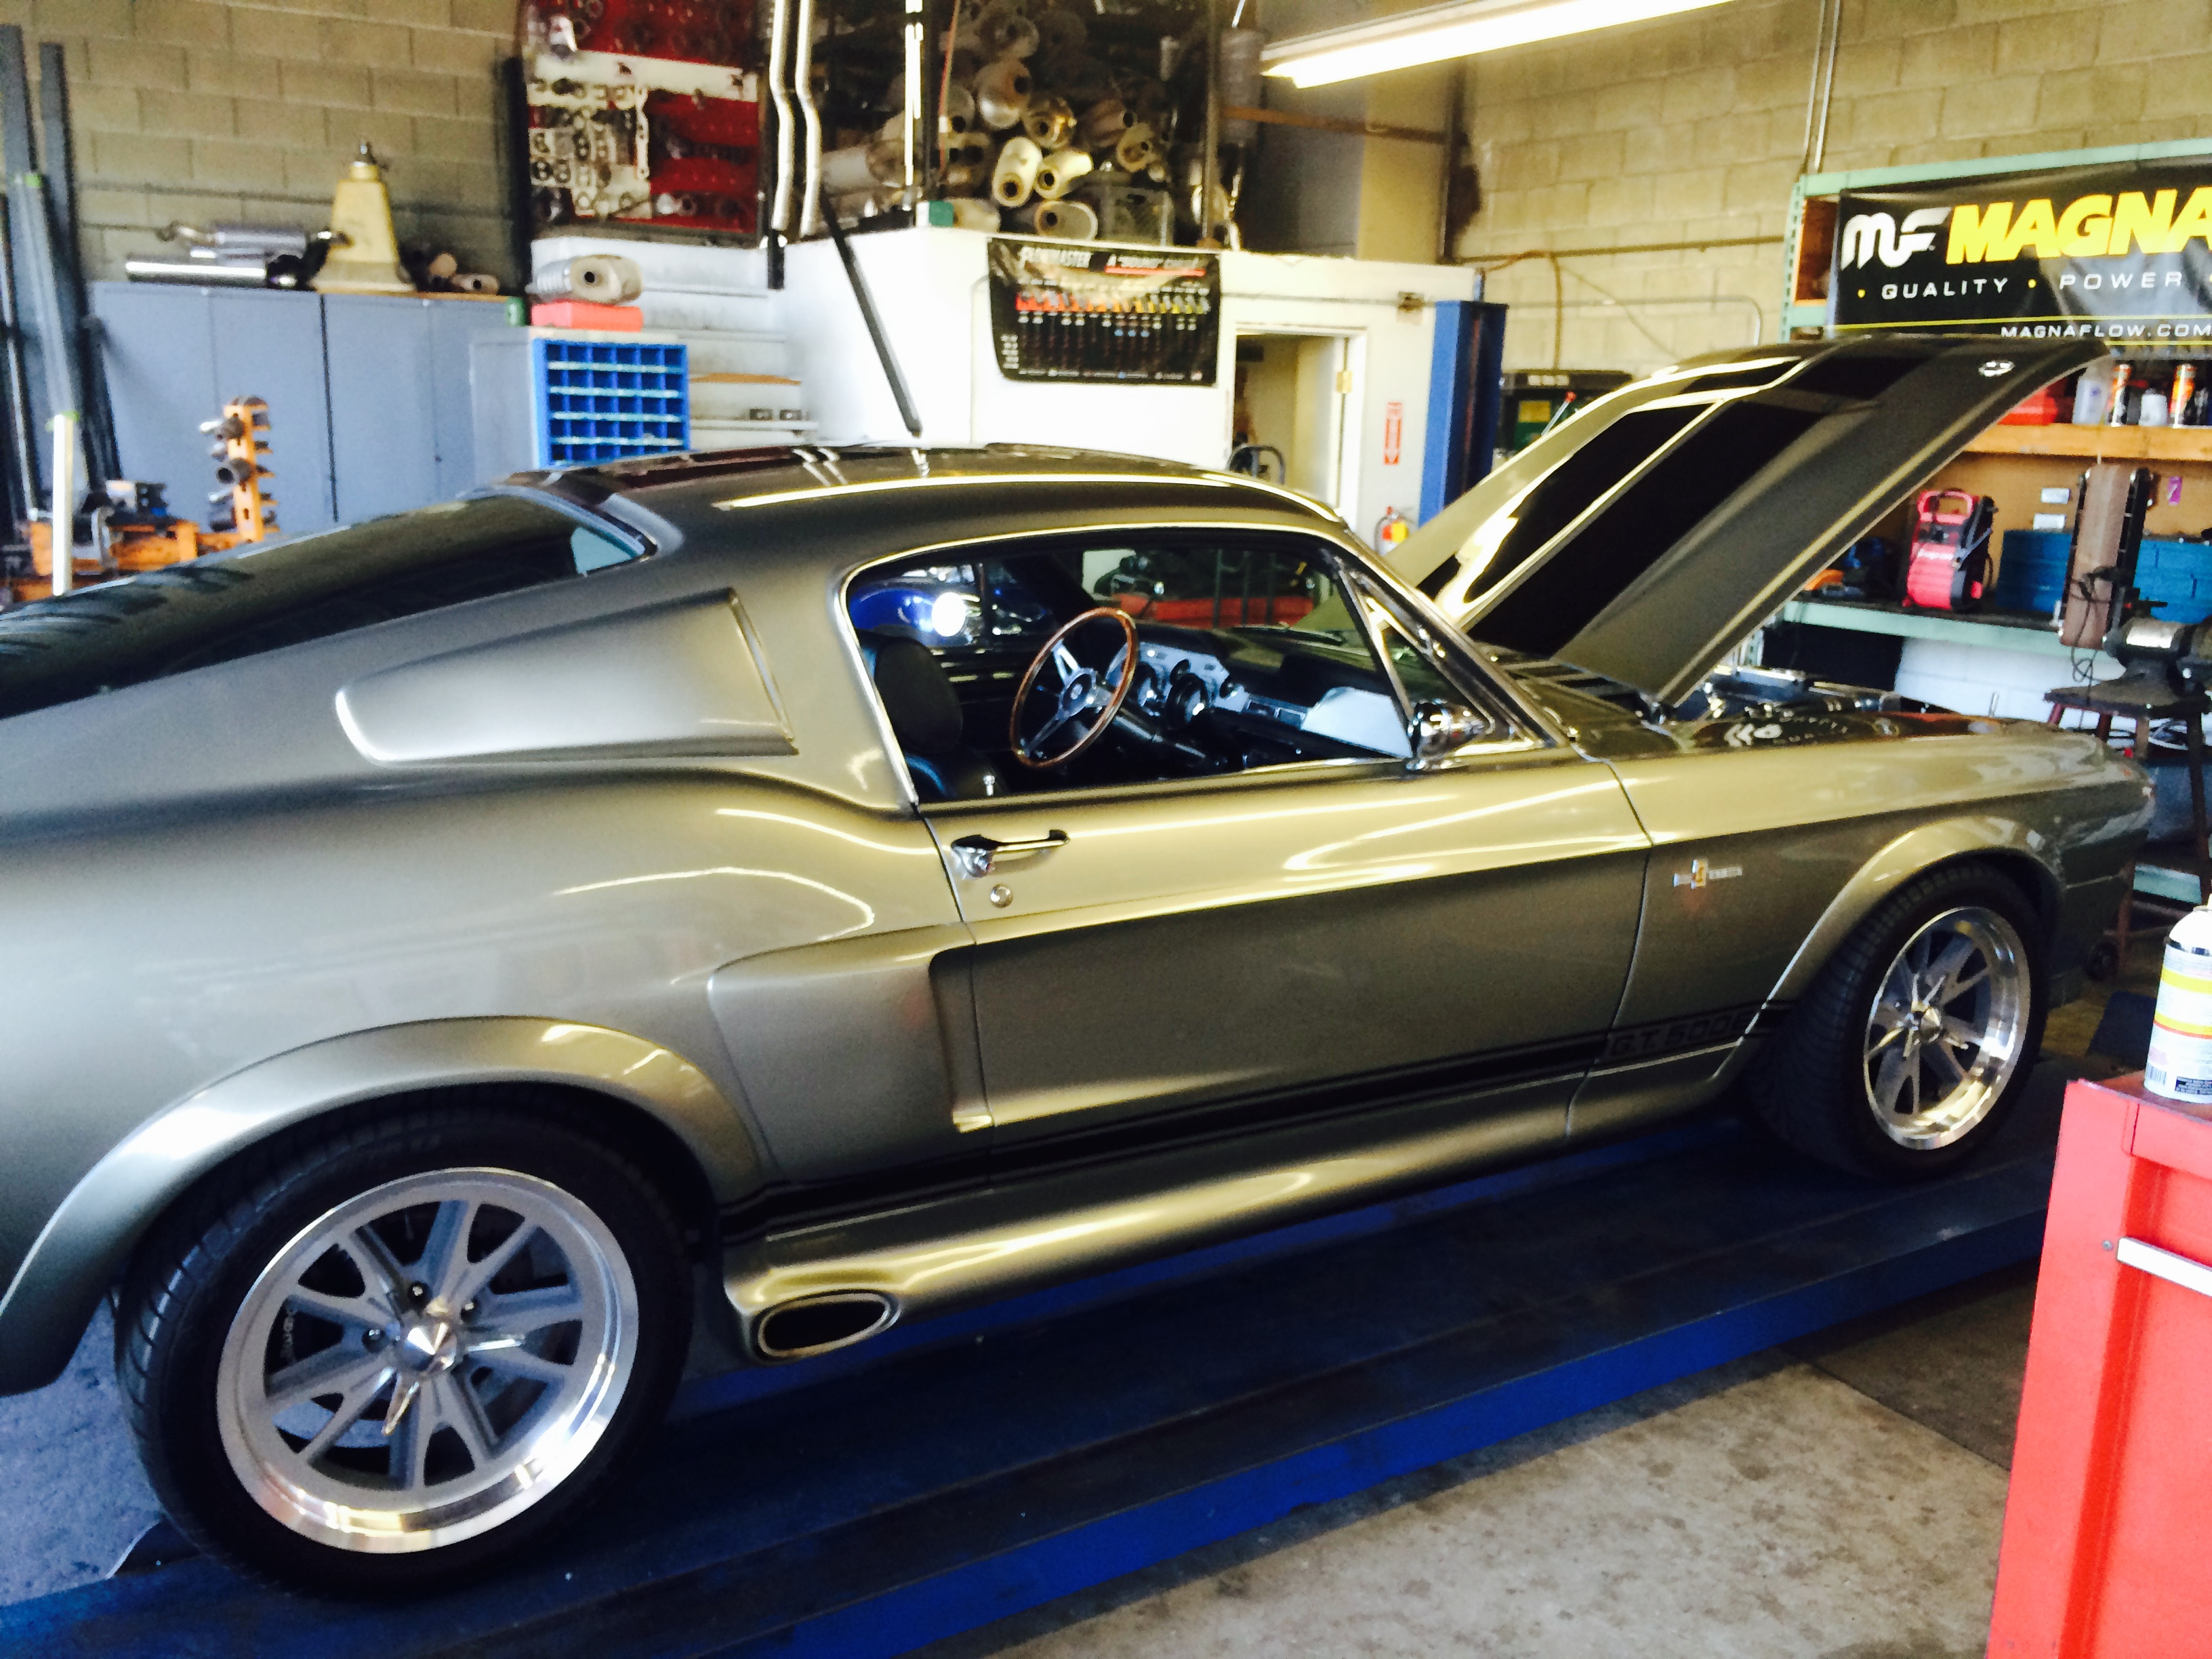 Toyota Stevens Creek >> Kwik Way Muffler San Jose's Best Exhaust Shop